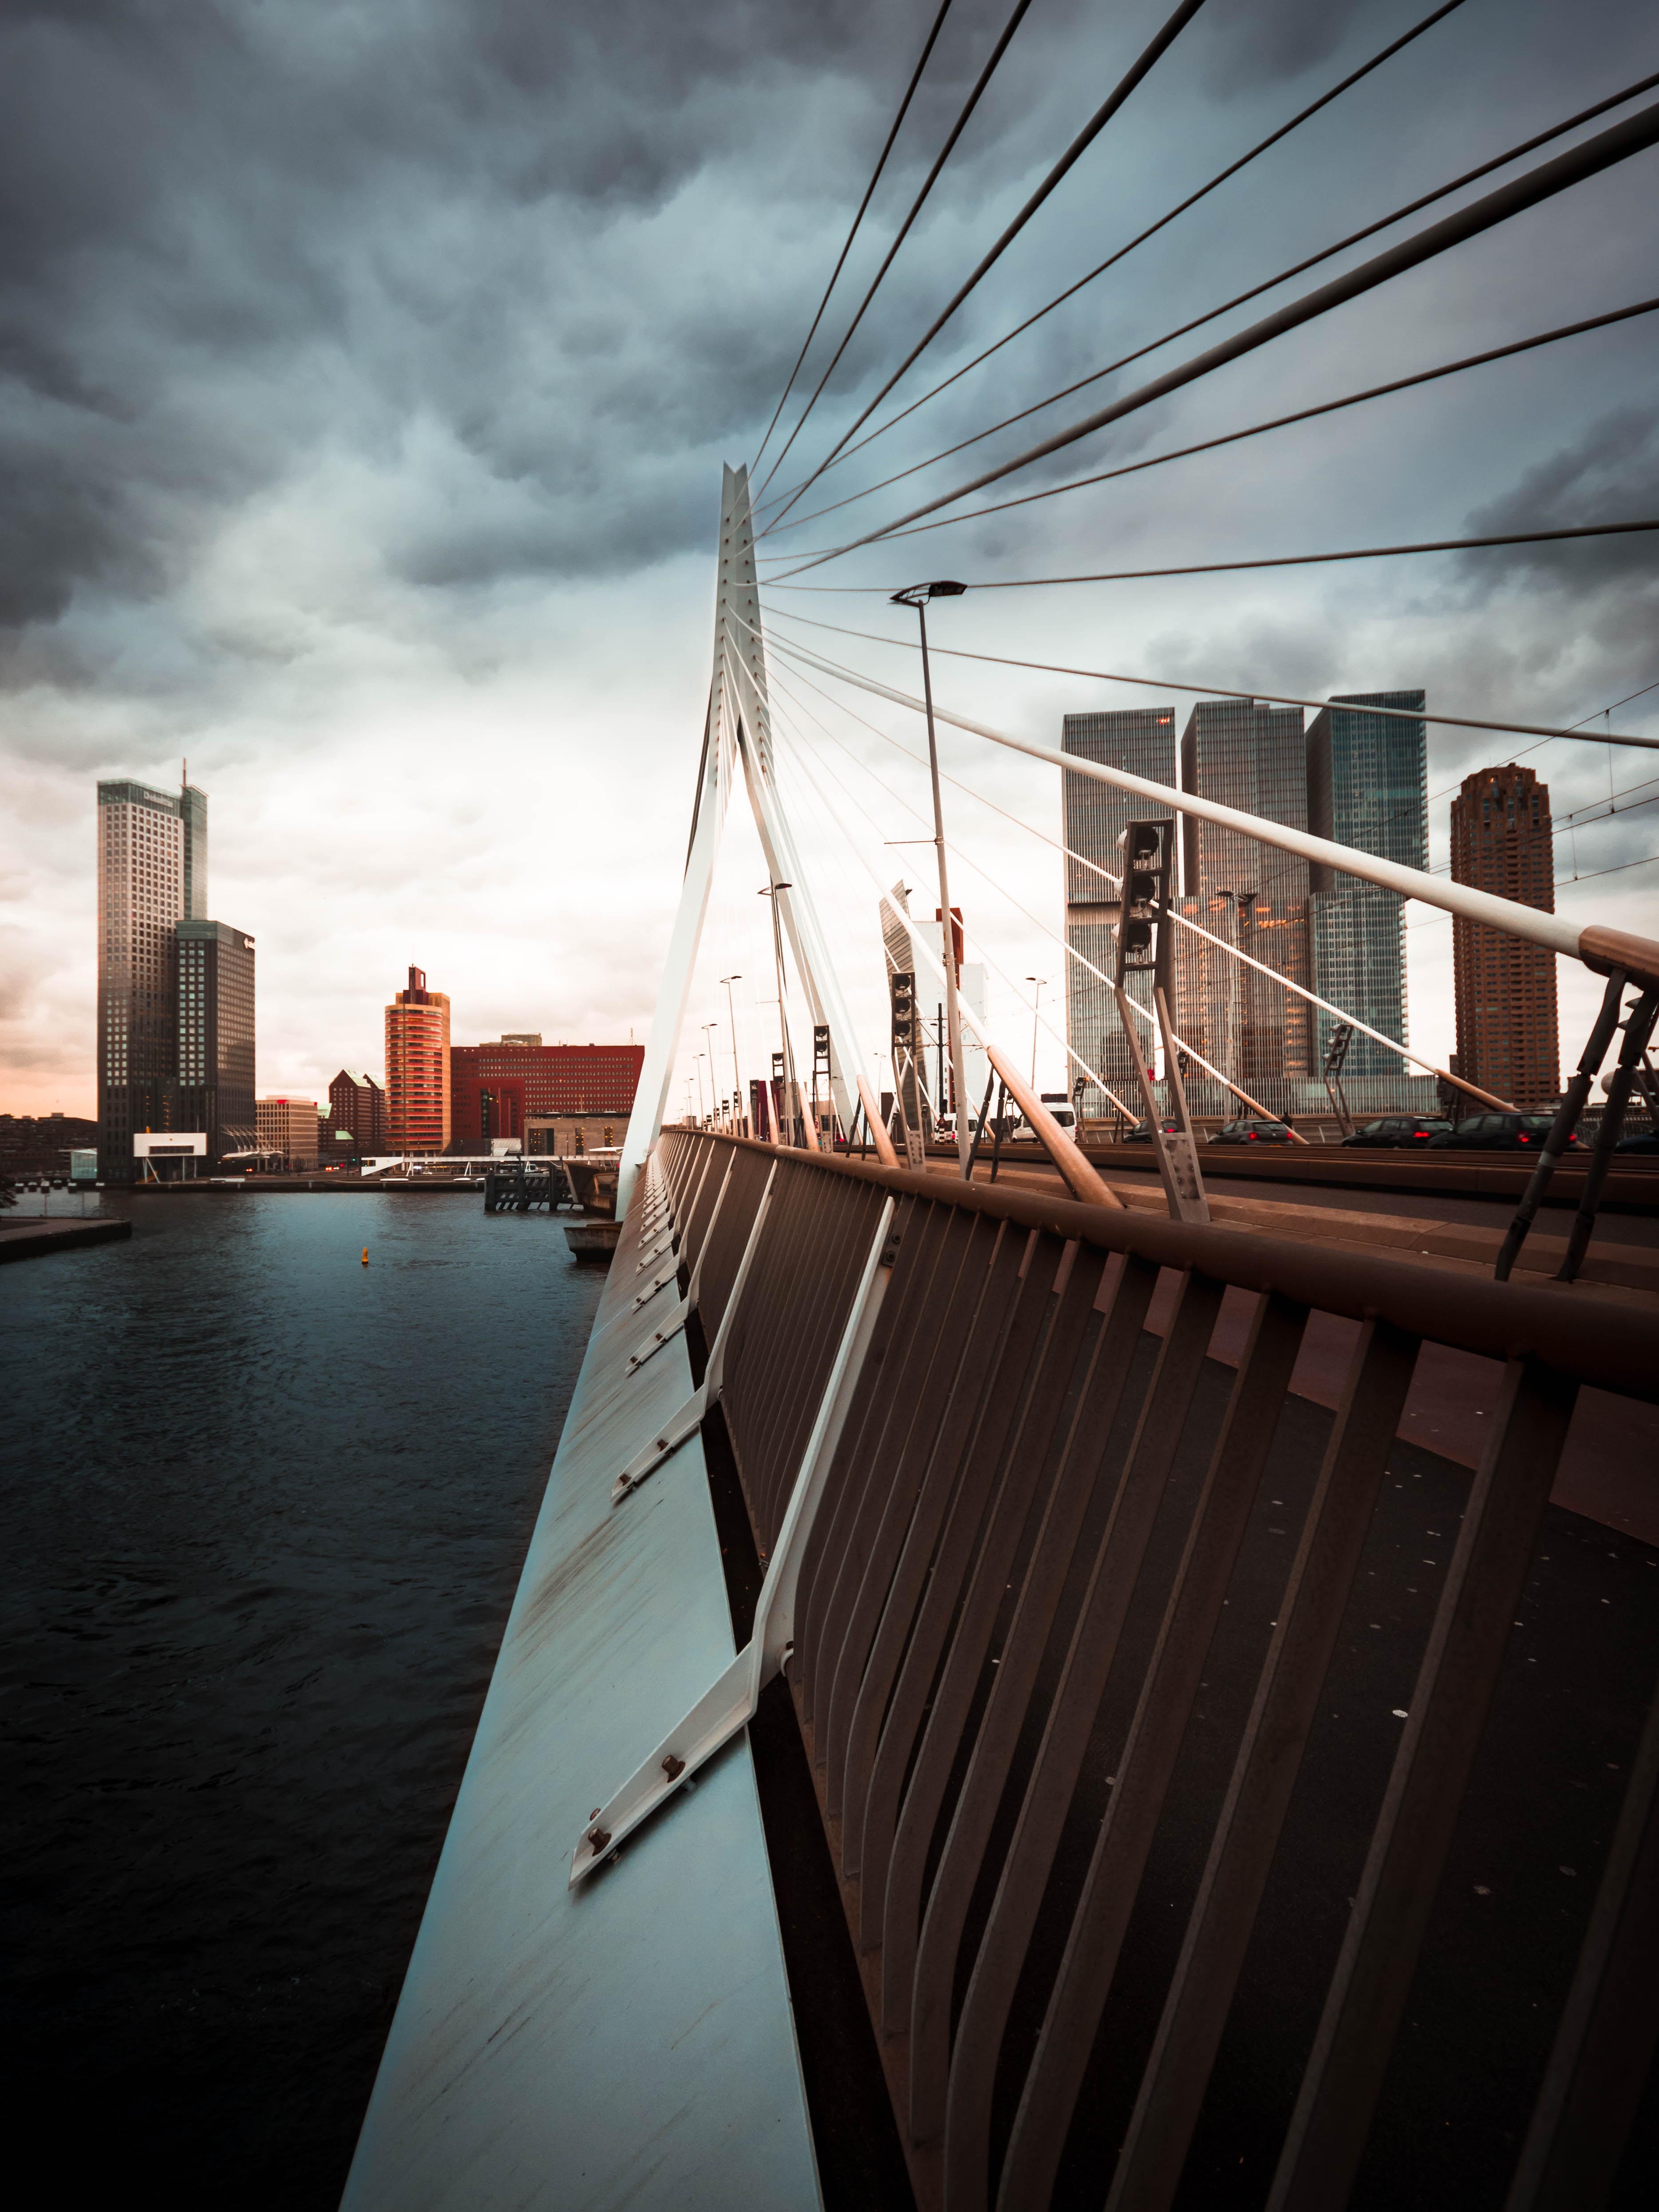 bridge beside body of water